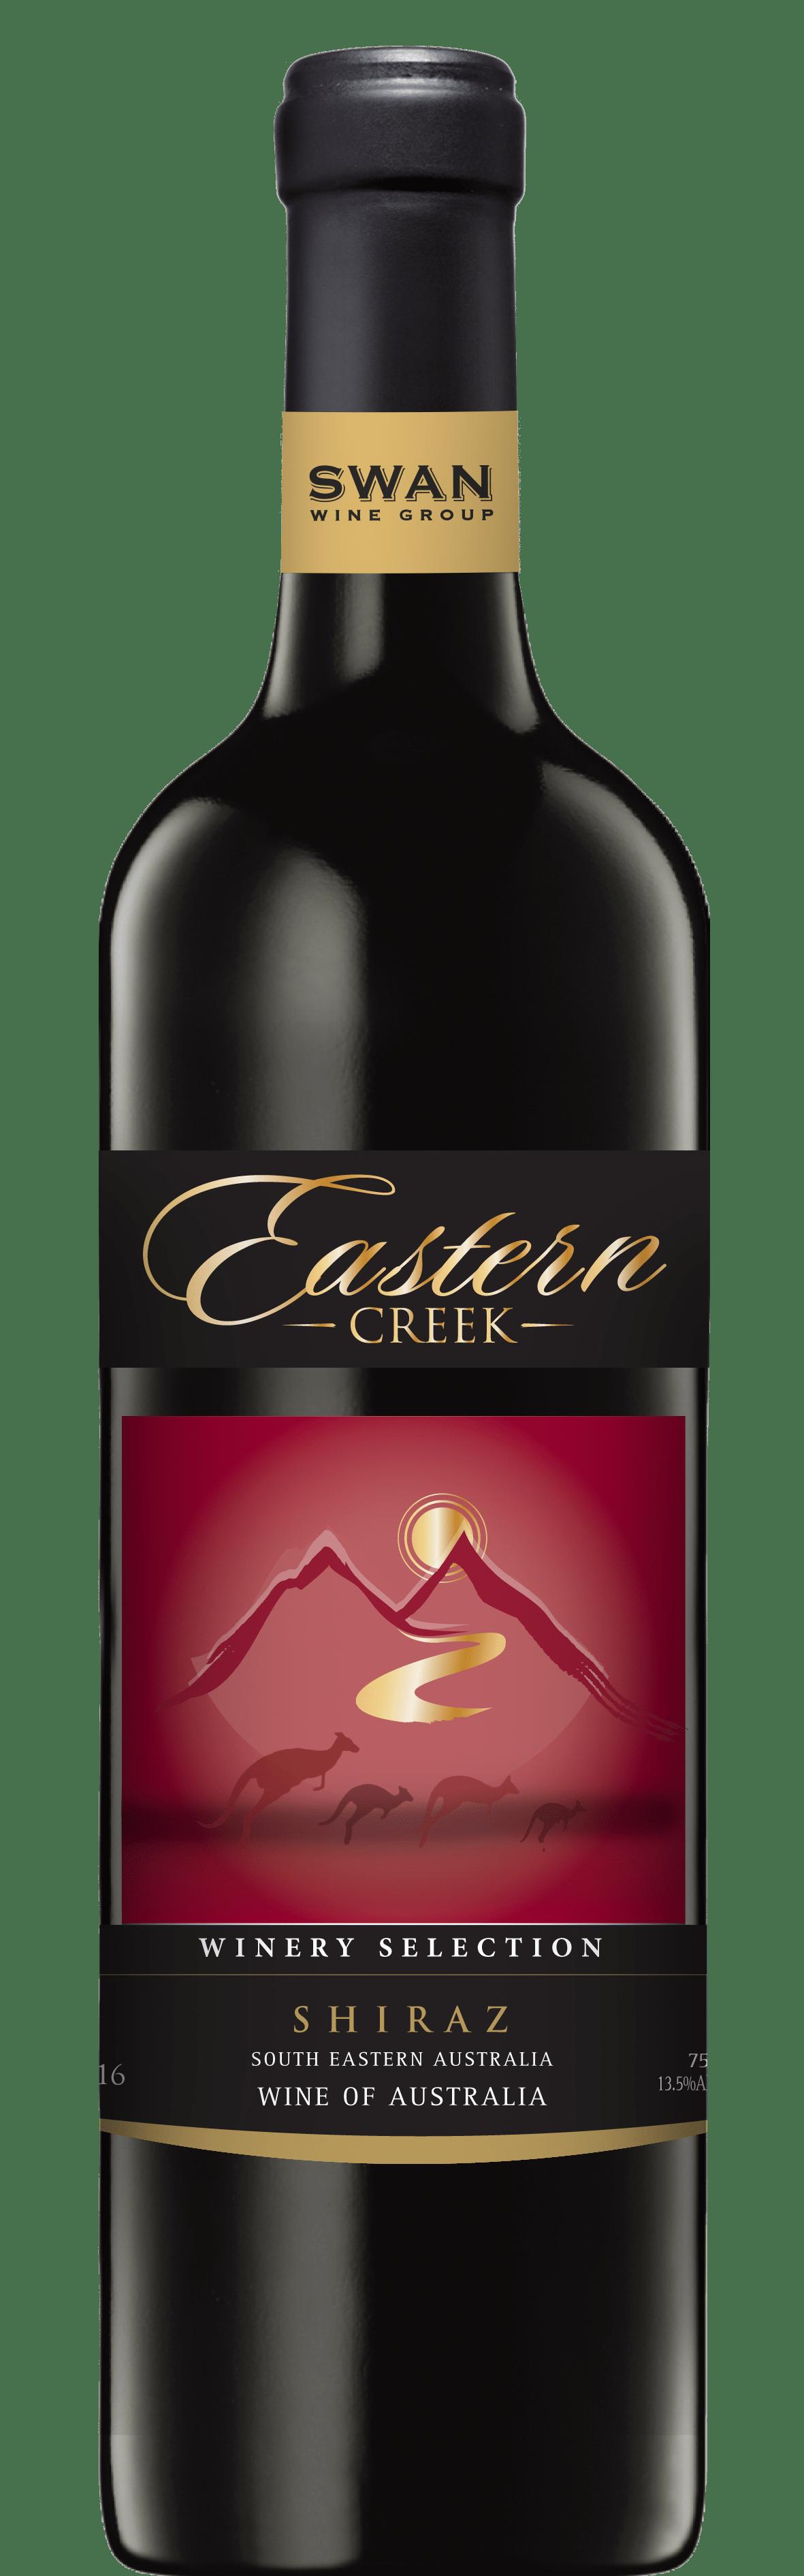 Eastern Creek Winery Selection Shiraz